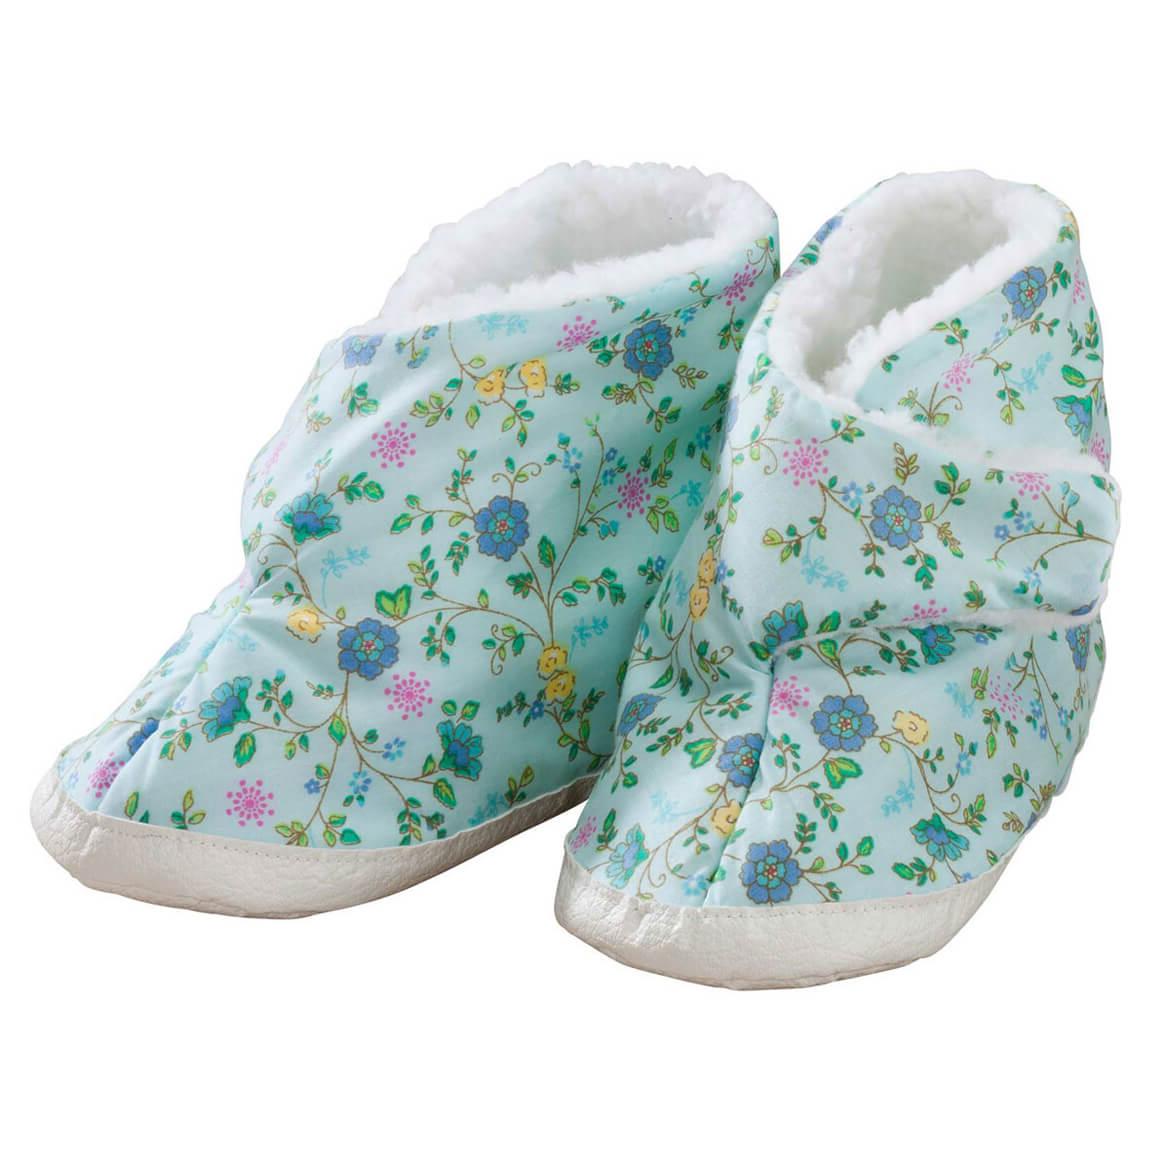 Women's Edema Slippers